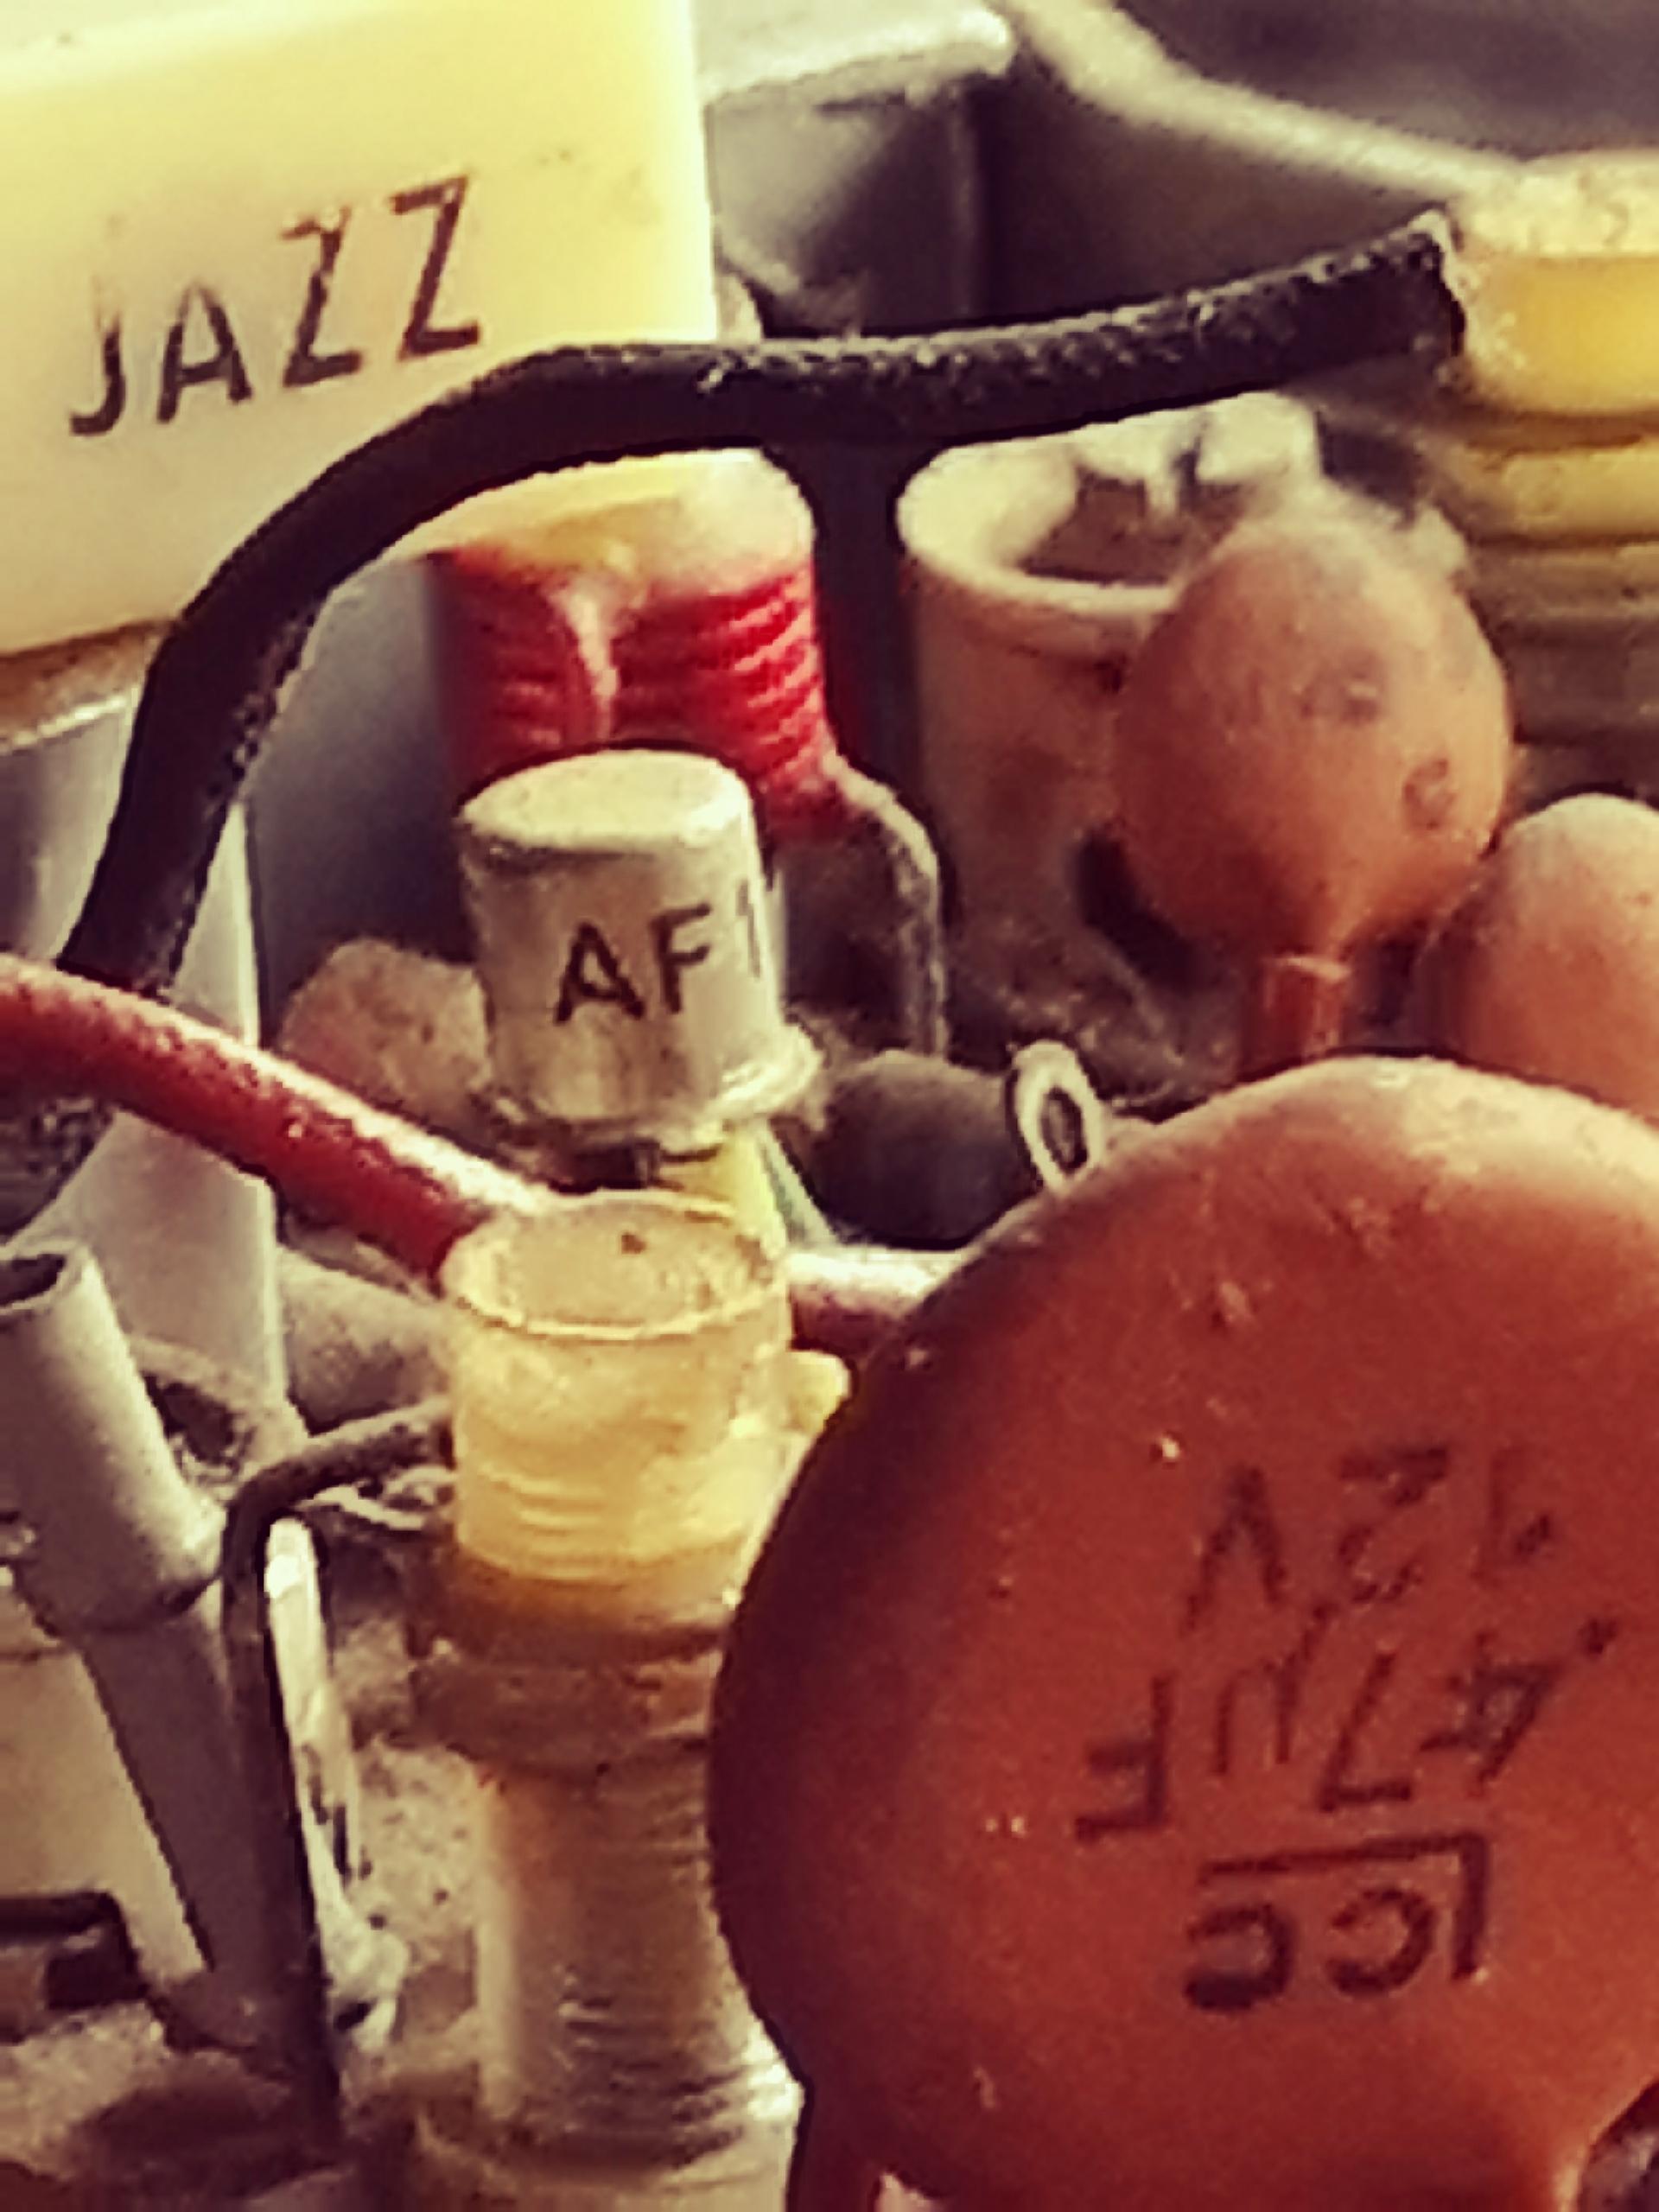 Darktronics Jazztronic hear mus - thedailywealthyaffiliate   ello